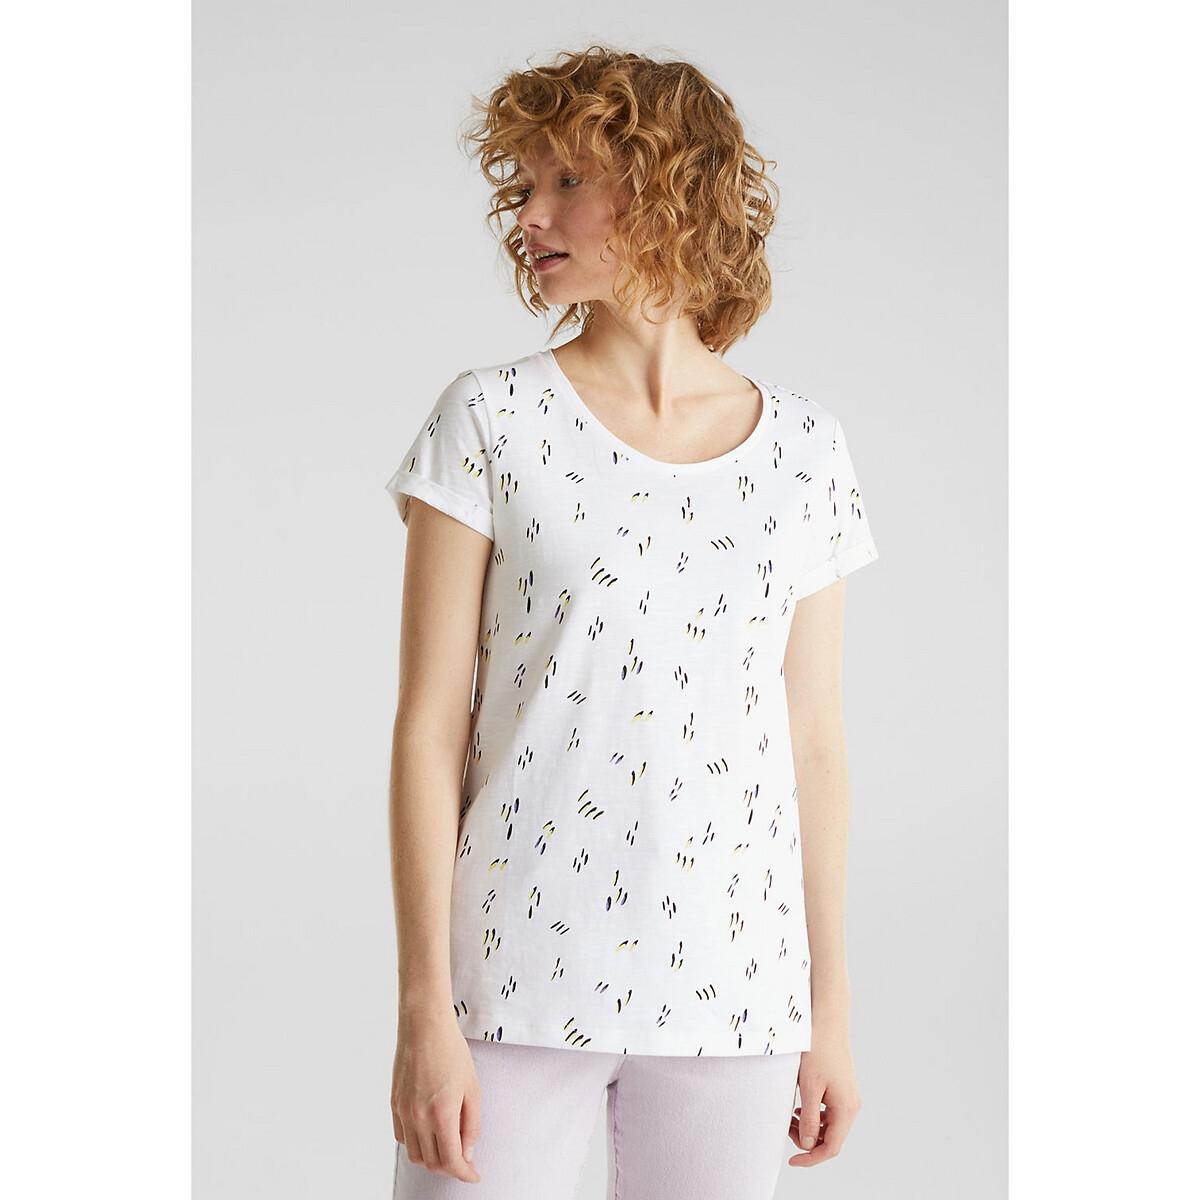 Camiseta con cuello redondo de algodón orgánico